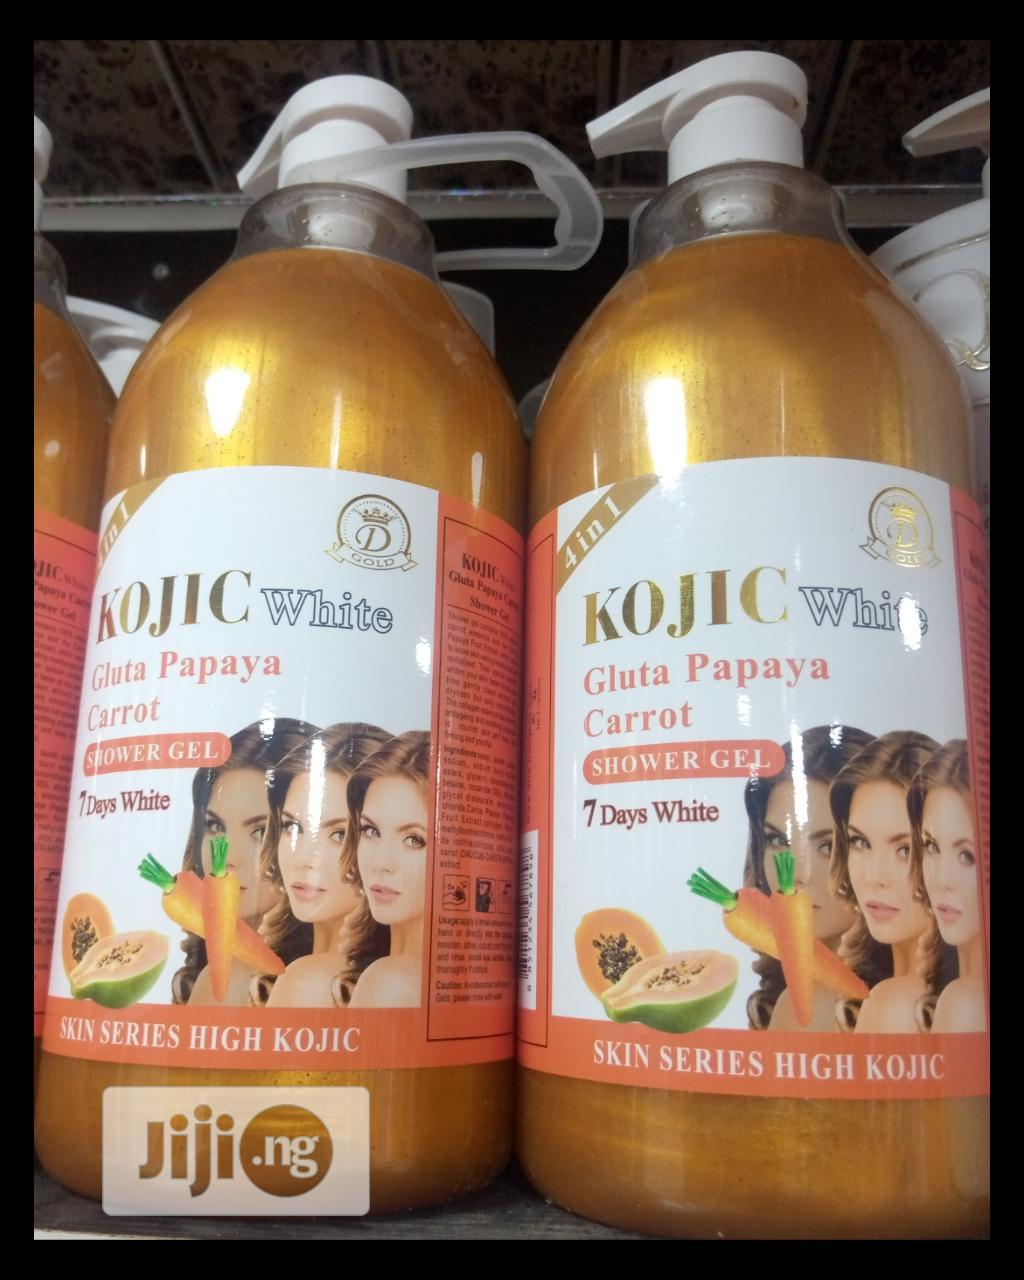 Kojic White Gluta Papaya Arbutin 7 Days White Shower Gel